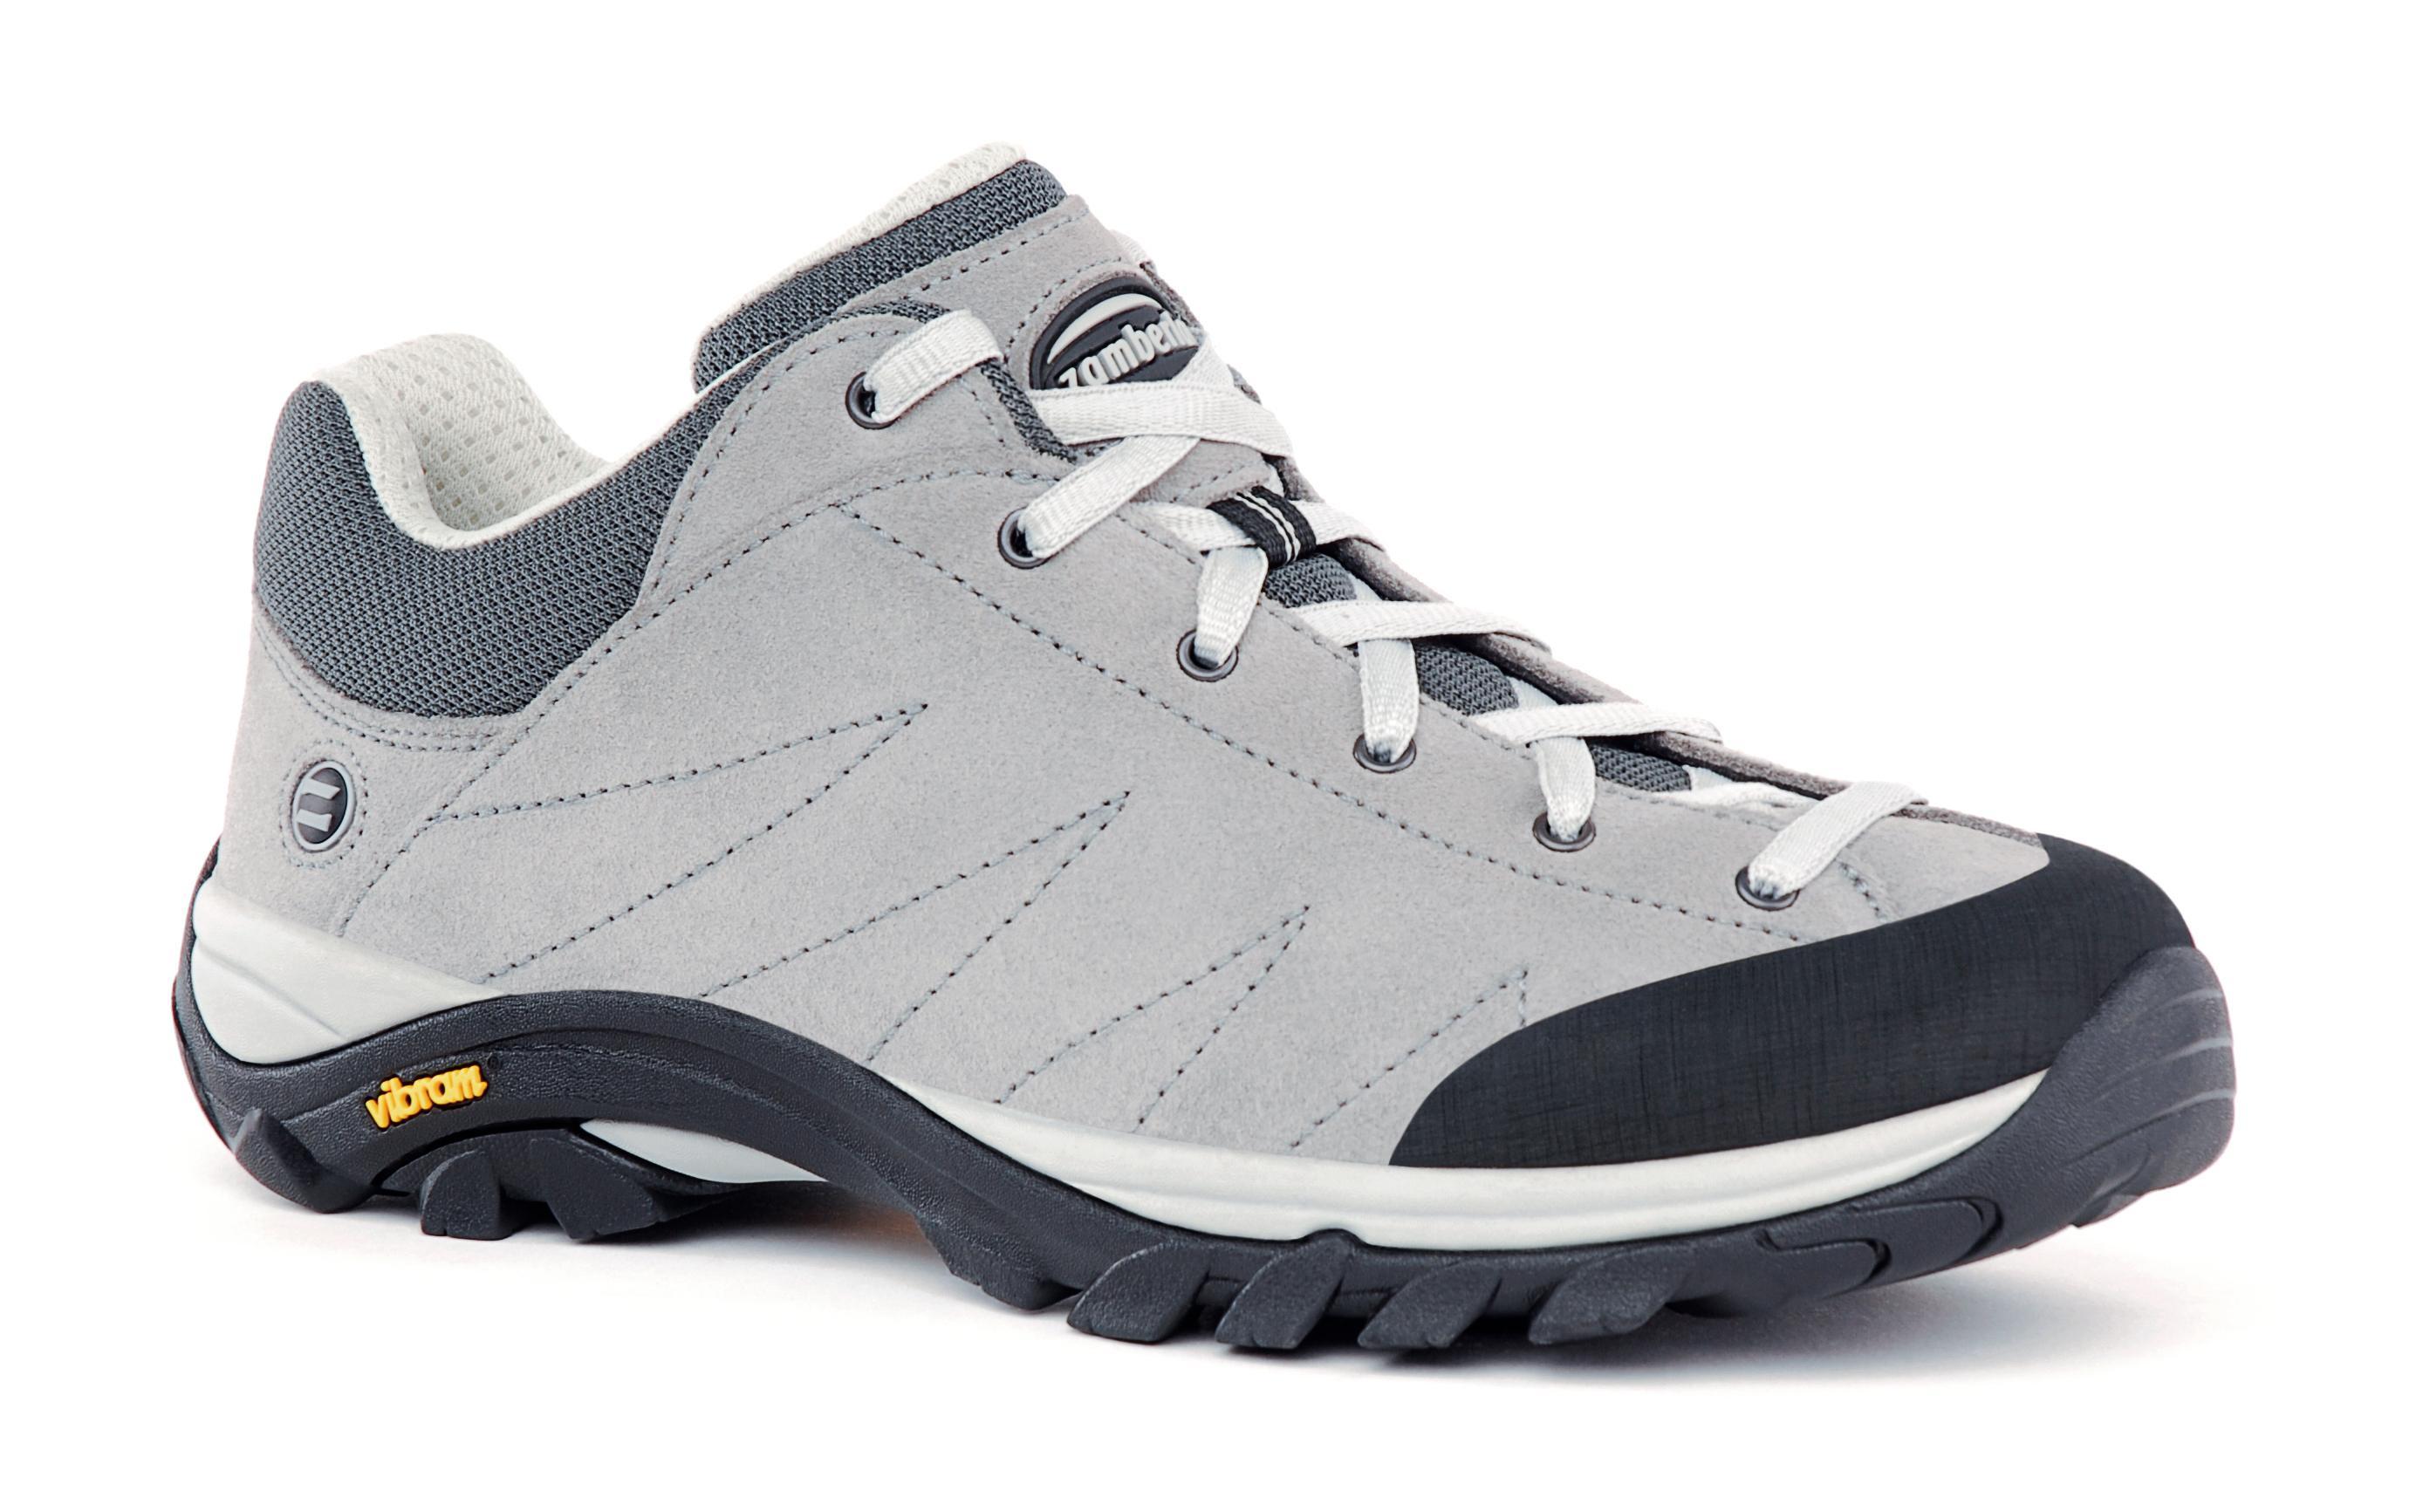 9e26580b4c0eb3 103 HIKE LITE RR WNS - Light Grey Women's Hiking Shoes Zamberlan